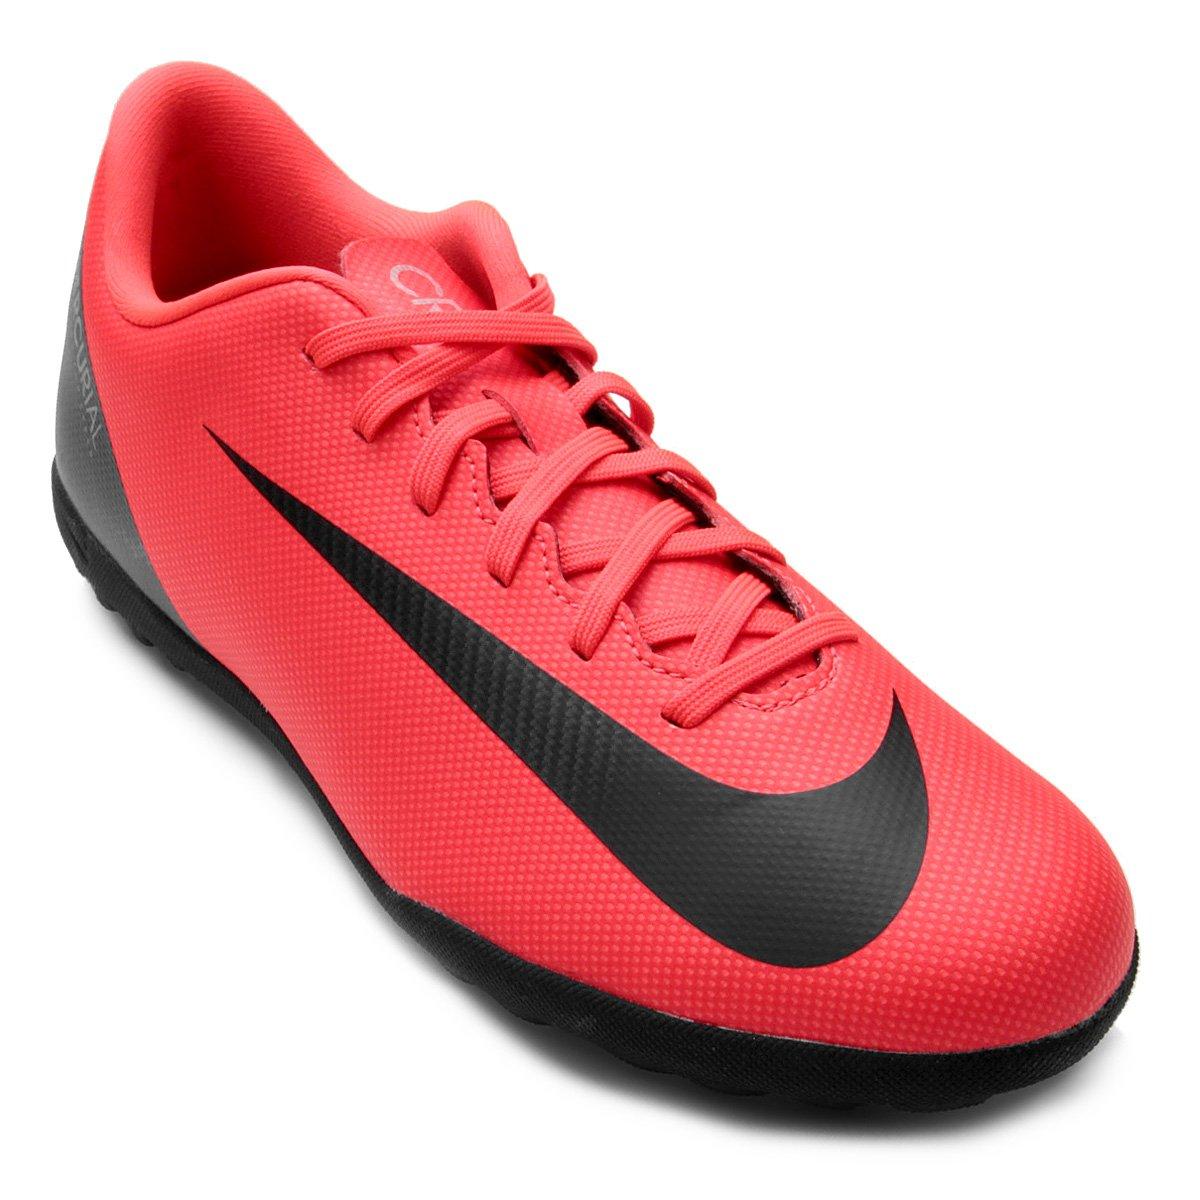 366df449851b4 Chuteira Society Nike Mercurial Vapor 12 Club CR7 TF | Shop Timão